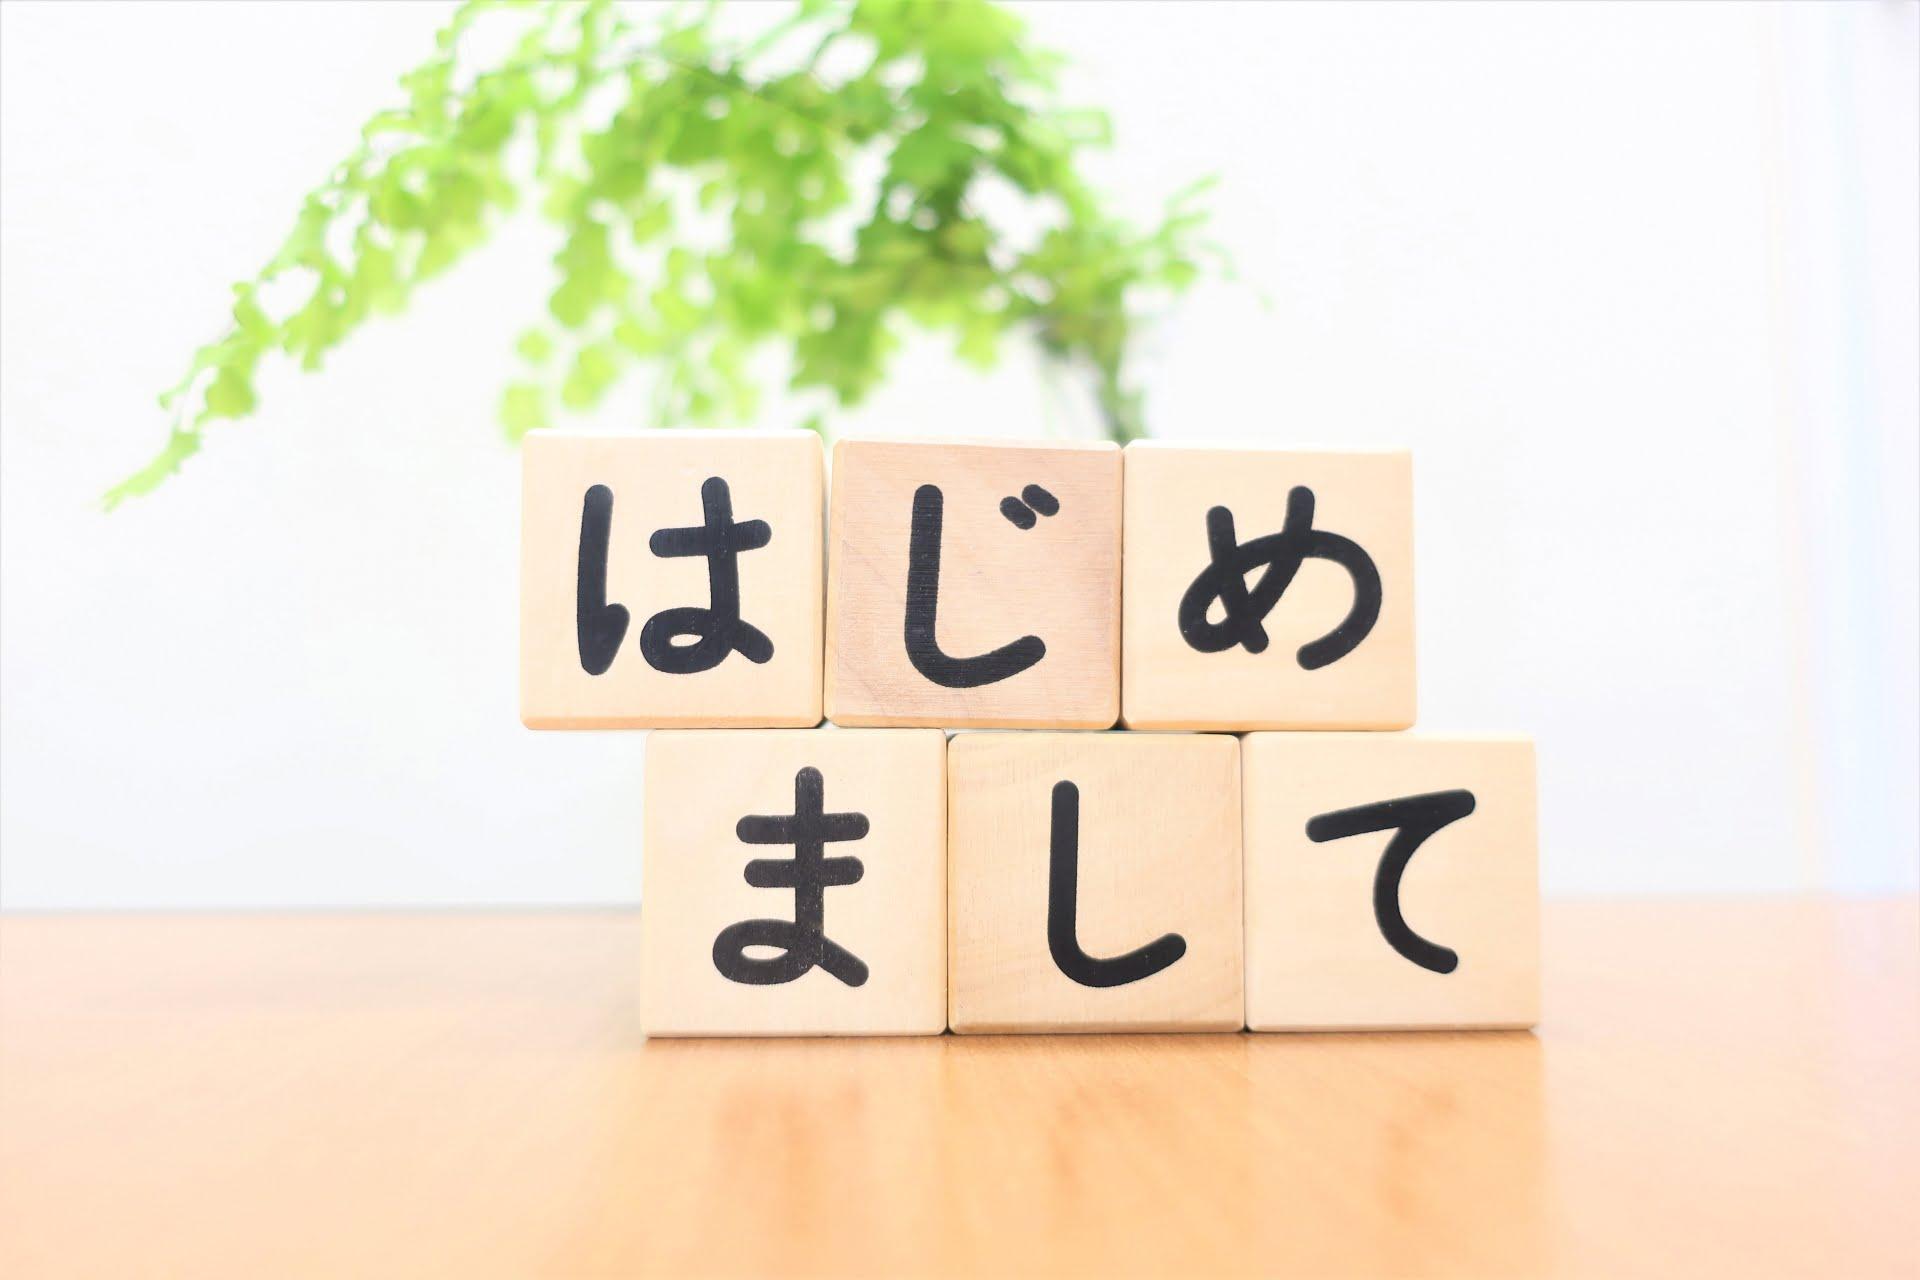 COMO USAR KANJI, HIRAGANA, Y KATAKANA + TU NOMBRE EN JAPONÉS (3 EN 1)